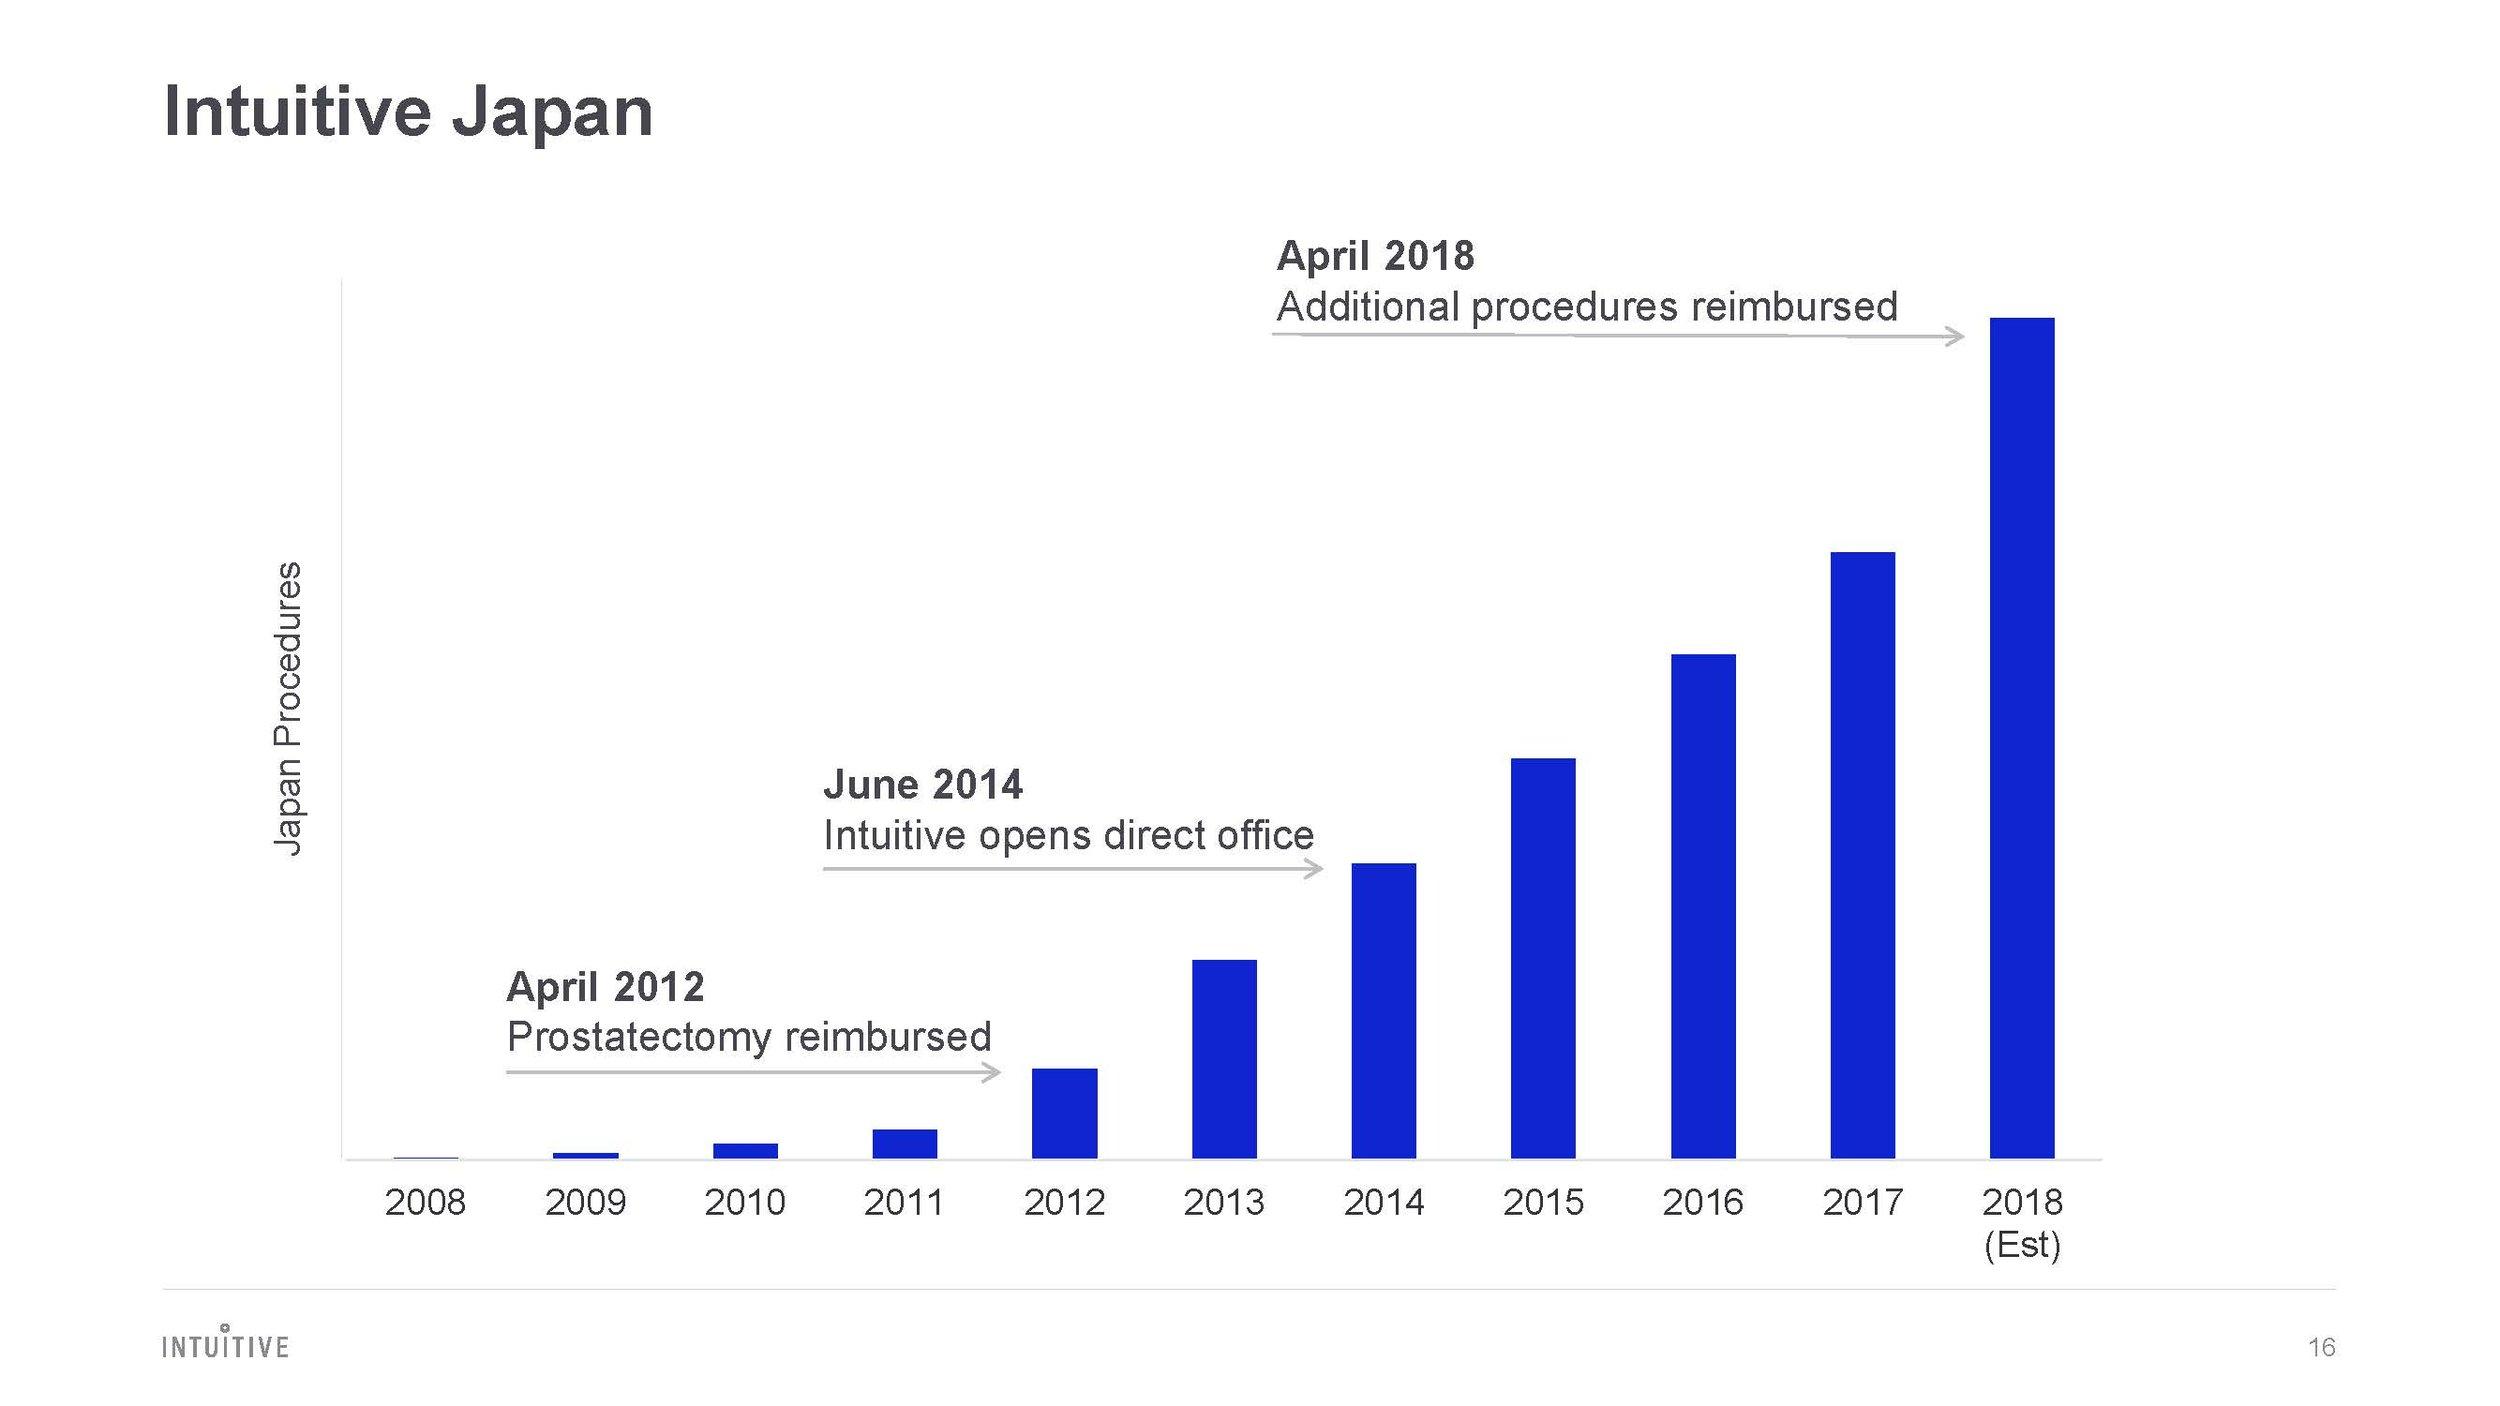 JPMorgan2019 Website_Page_16.jpg